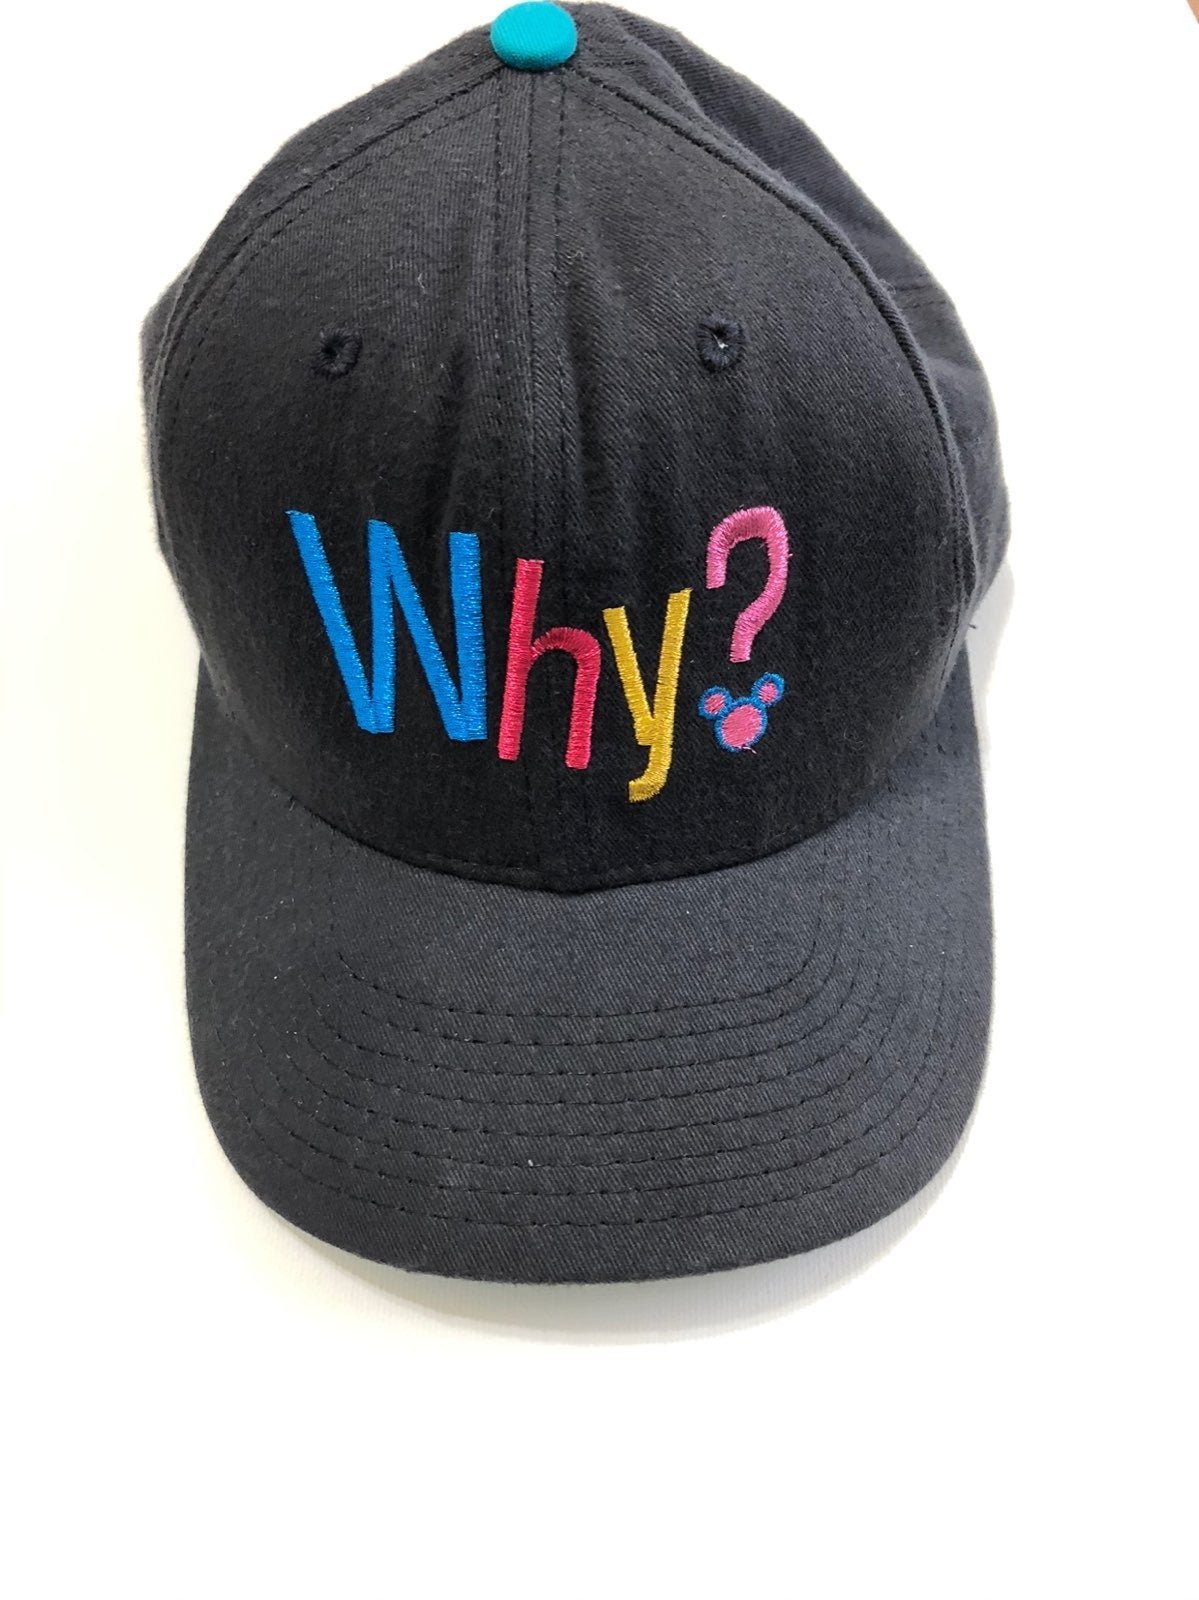 Goofys Hat Black baseball cap walt disne